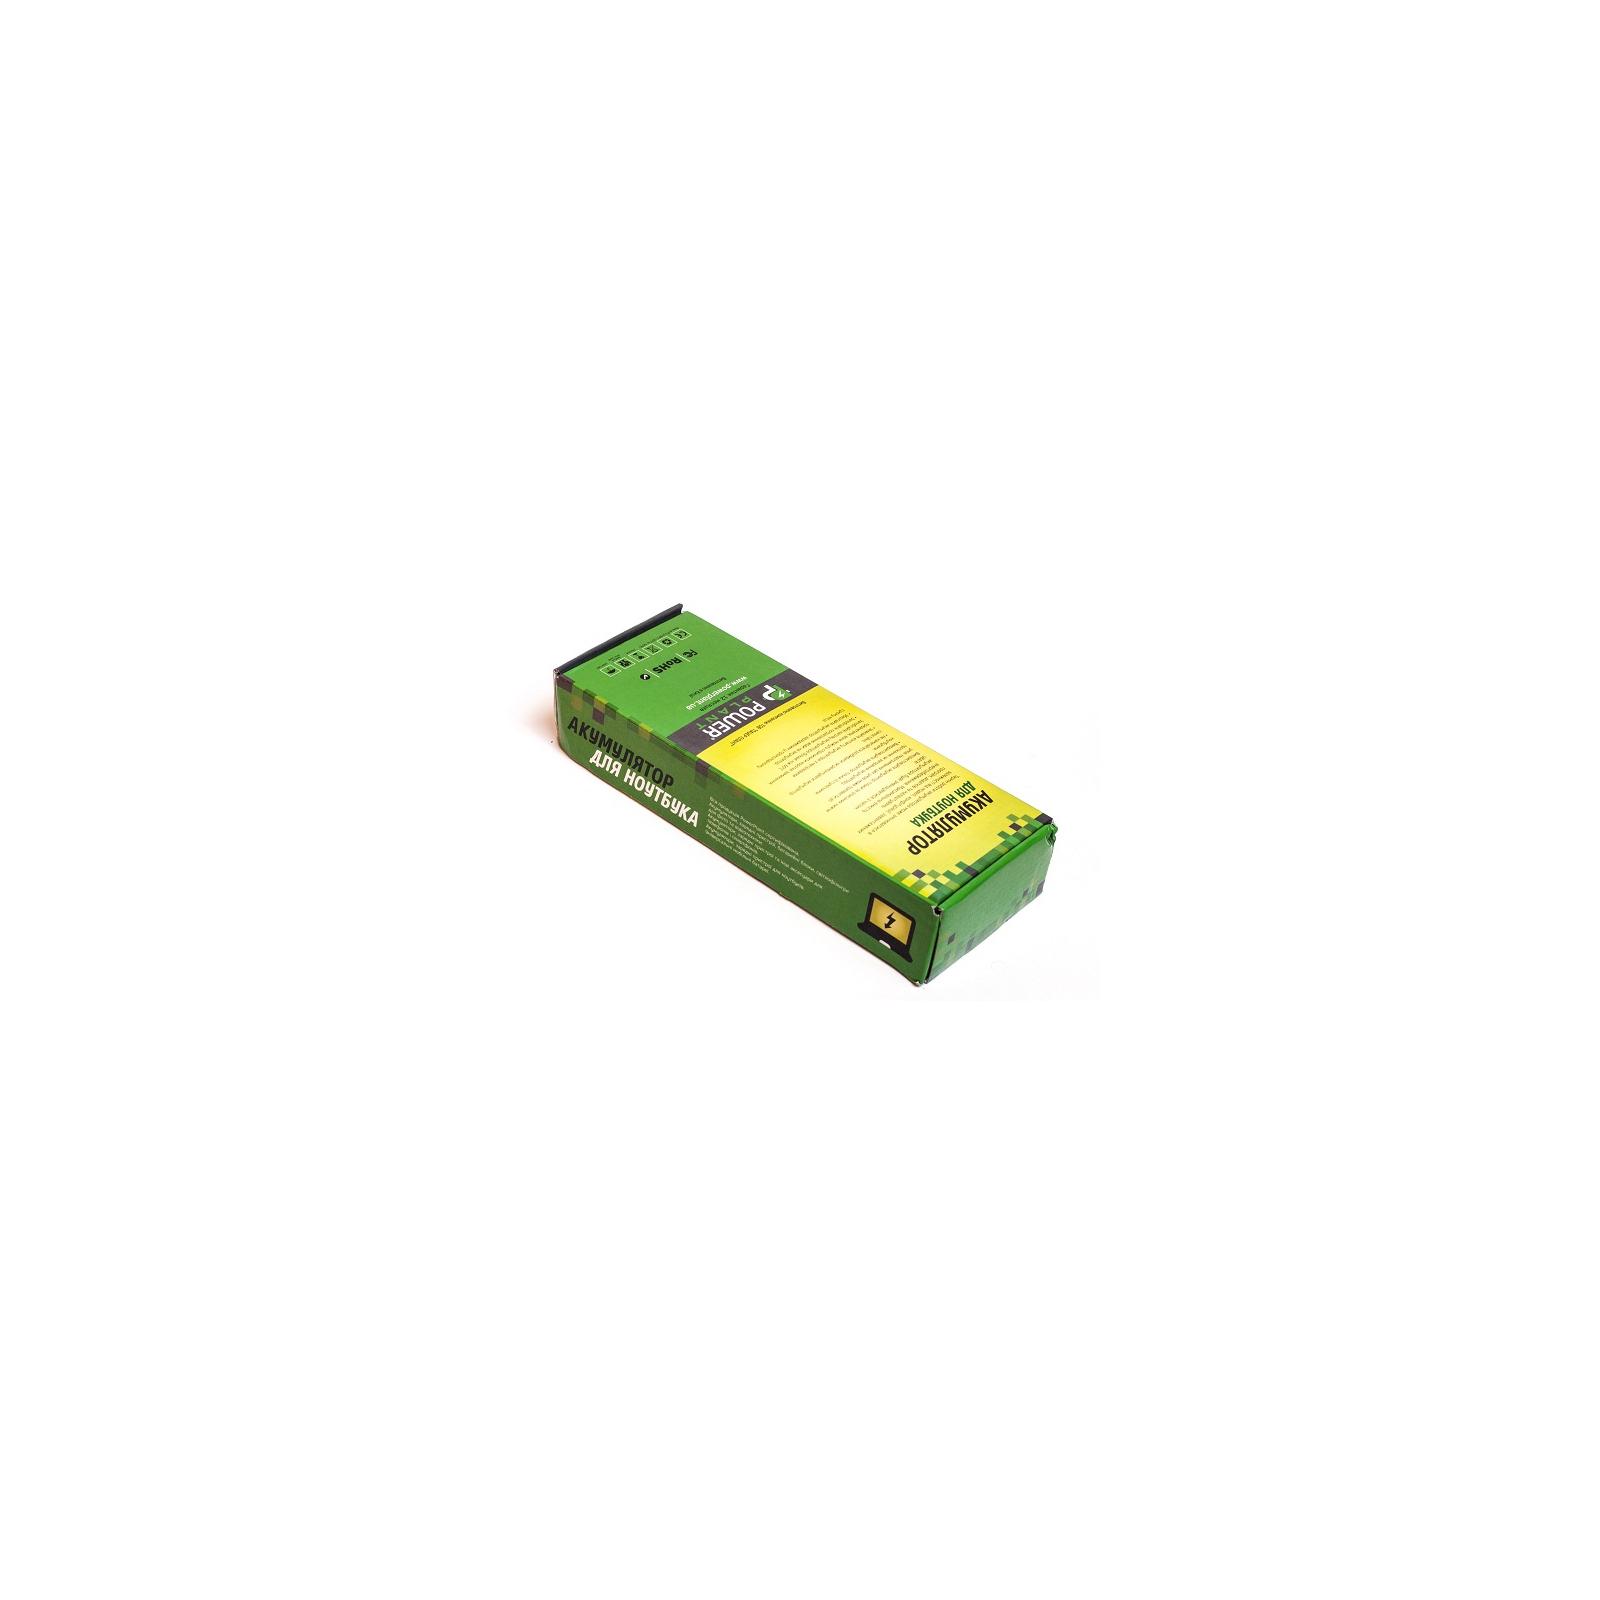 Аккумулятор для ноутбука HP DV3-2000 (HSTNN-IB93, H3128LH) 10.8V 5200mAh PowerPlant (NB00000124) изображение 2